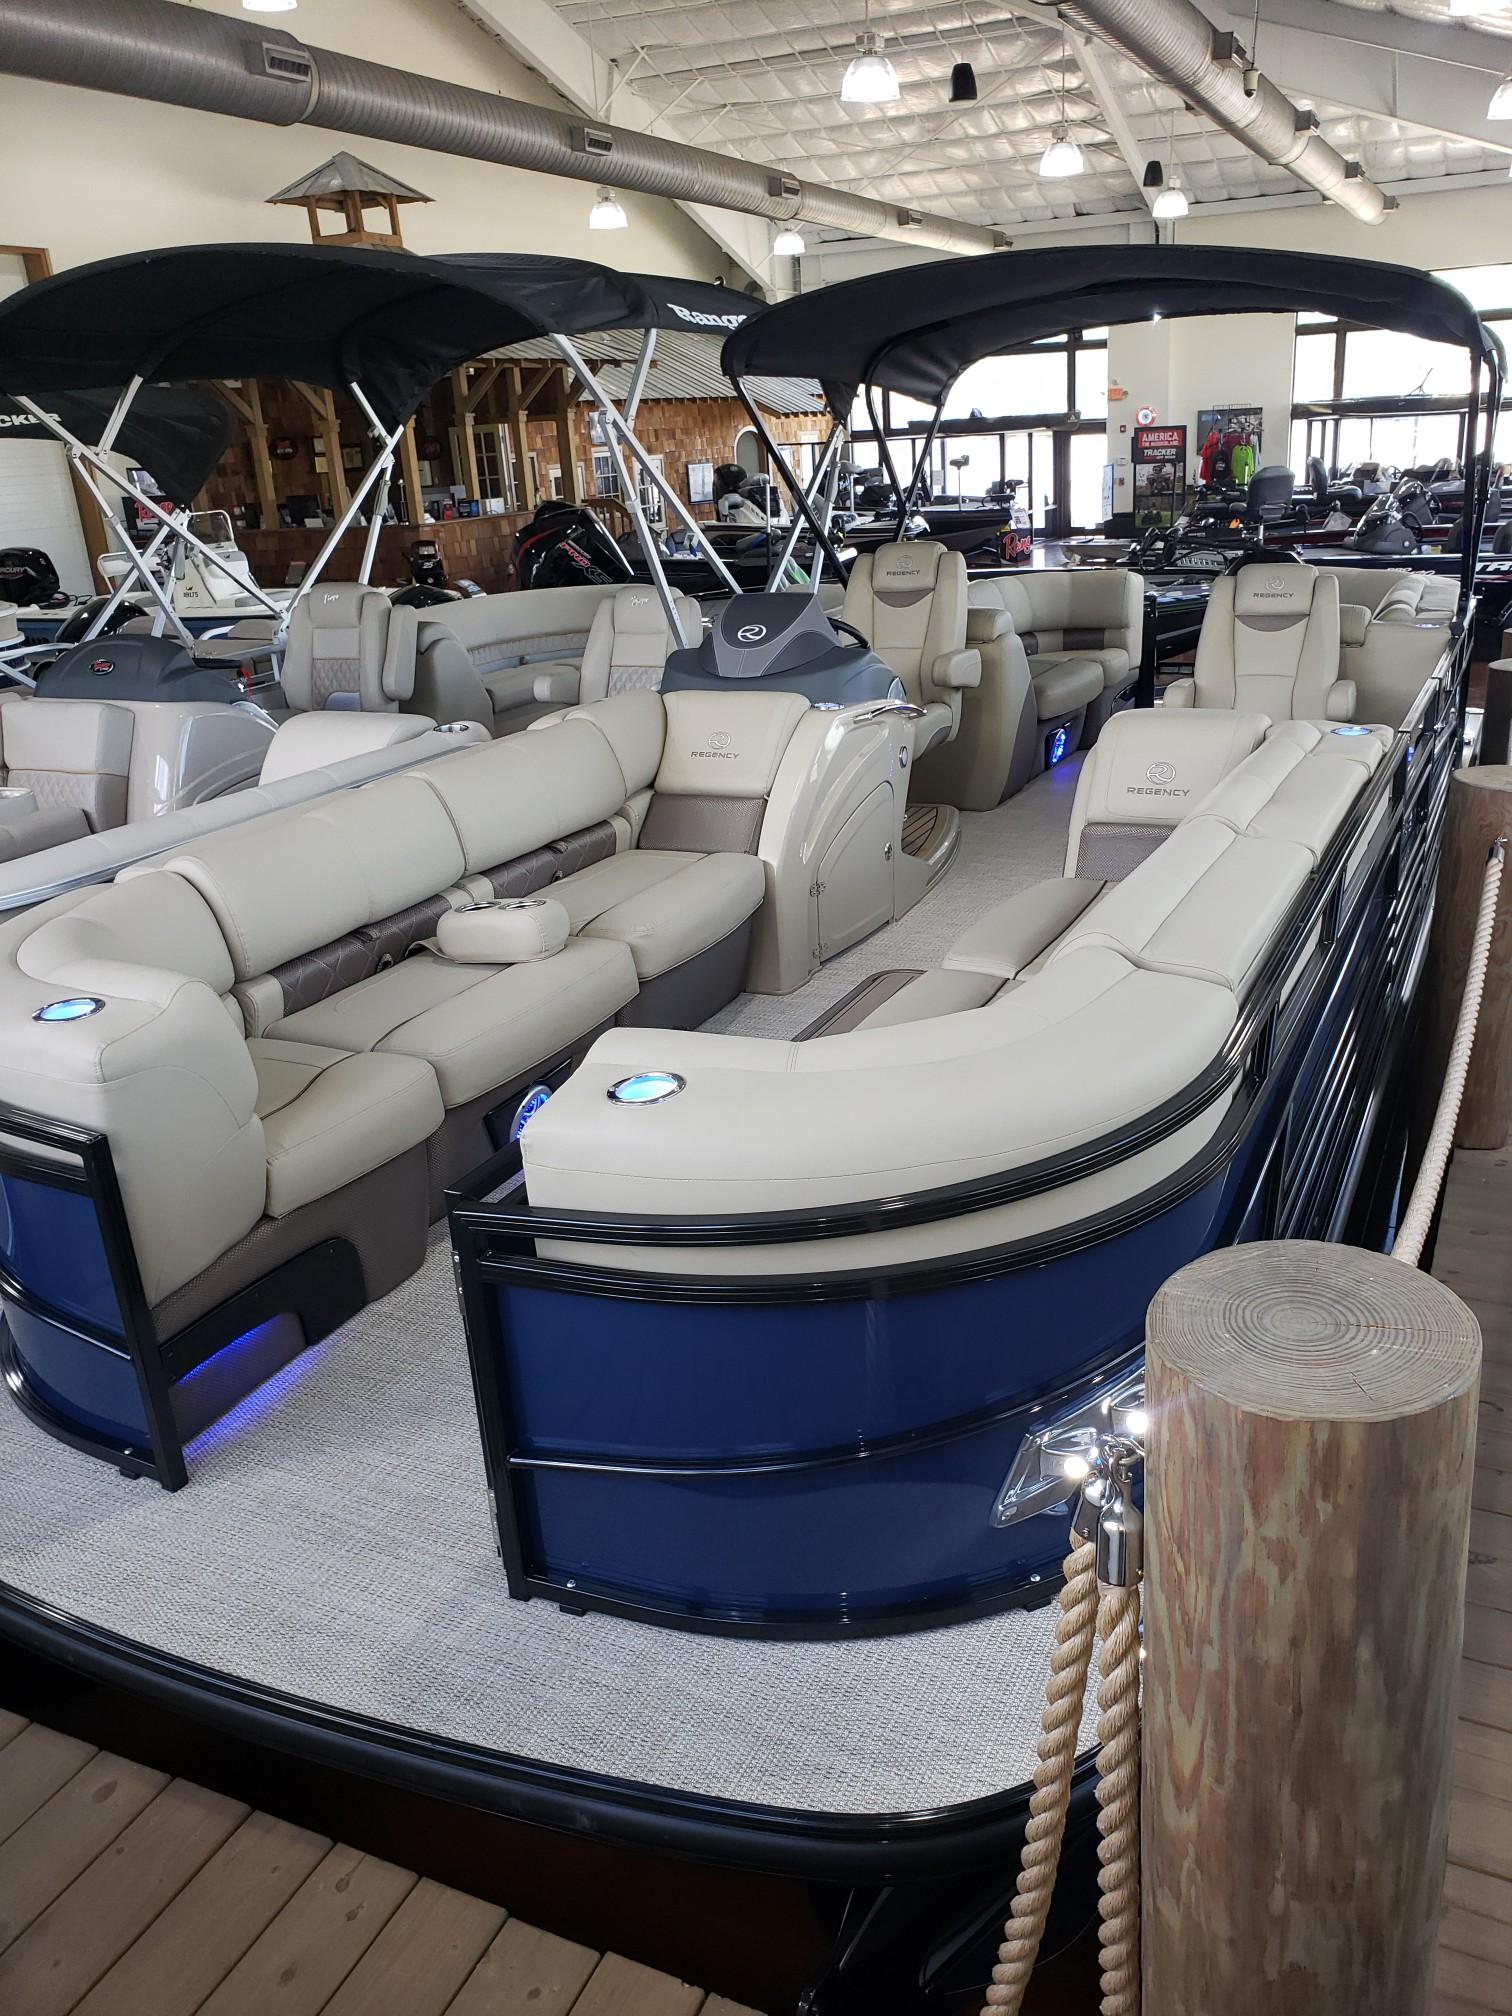 2020 Regency boat for sale, model of the boat is 250 LE3 w/300L Verado & Image # 12 of 27